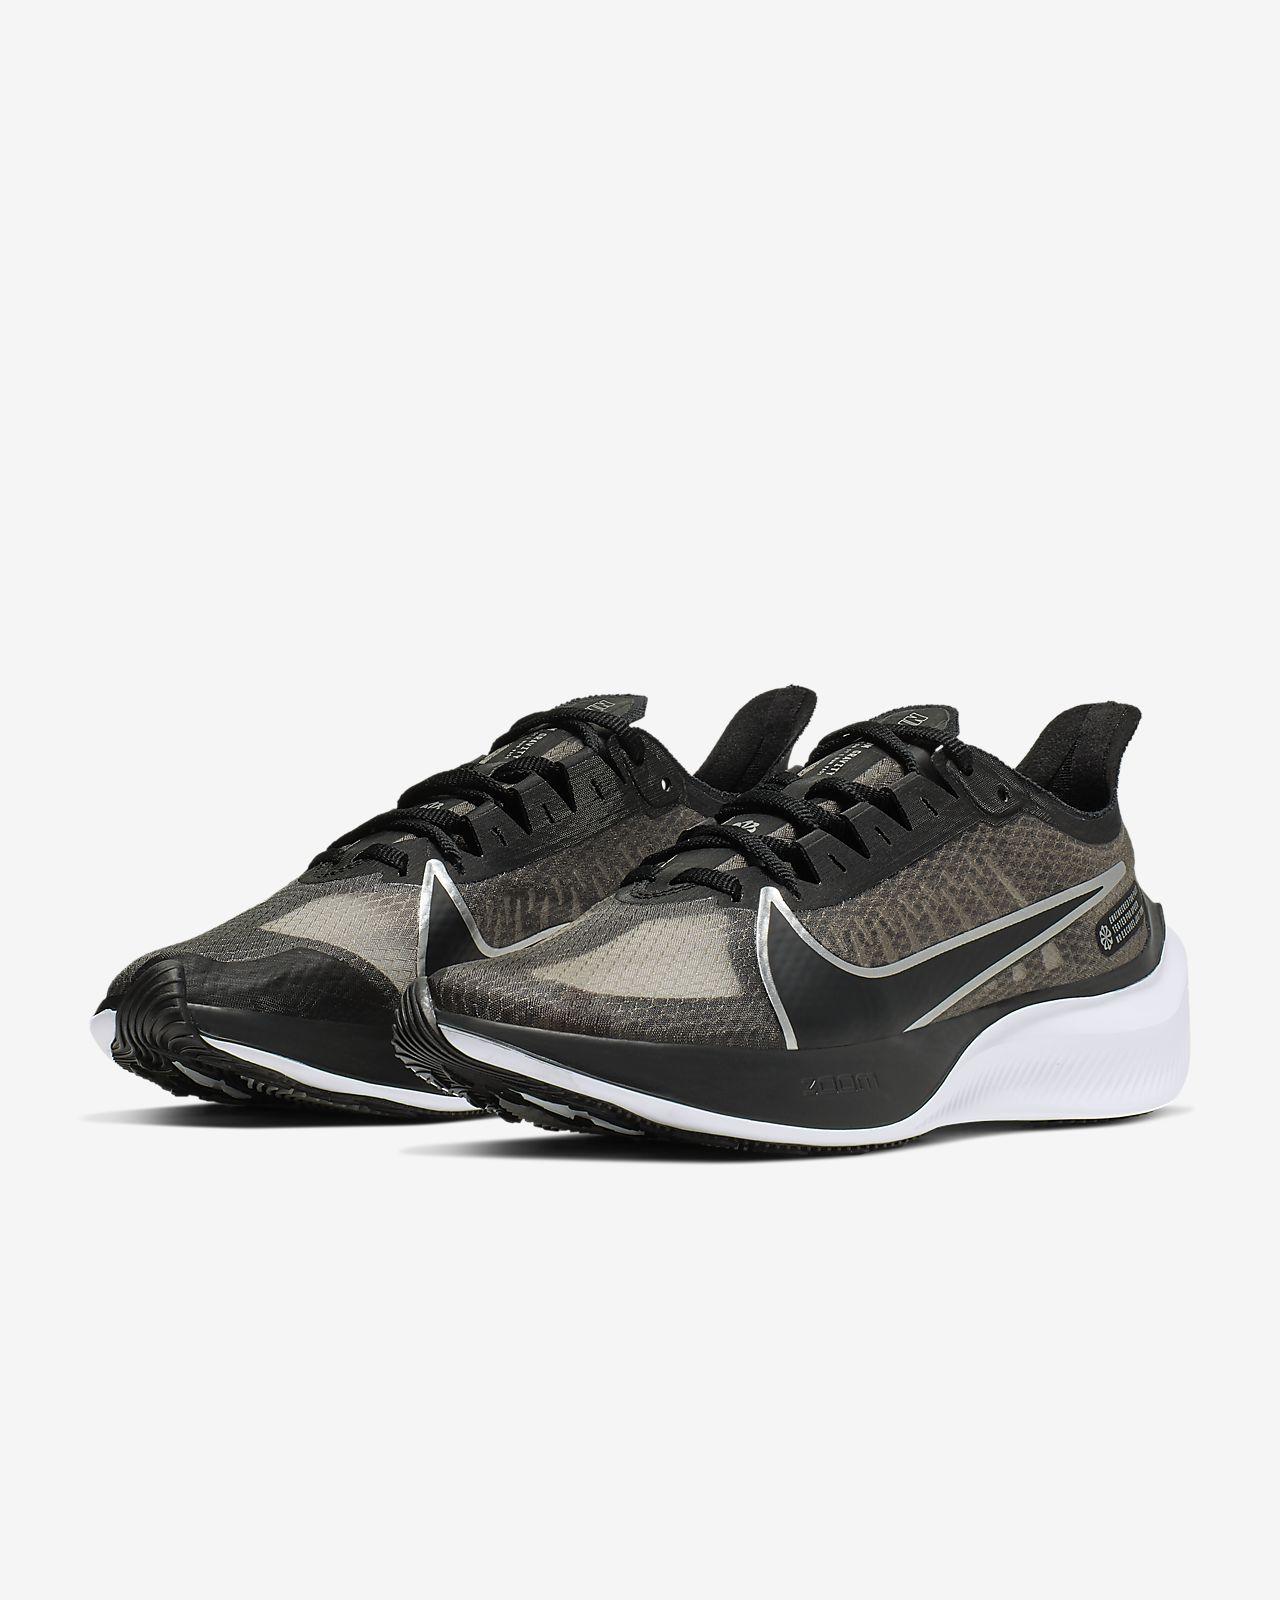 Zapatillas de running de mujer Zoom Gravity Nike